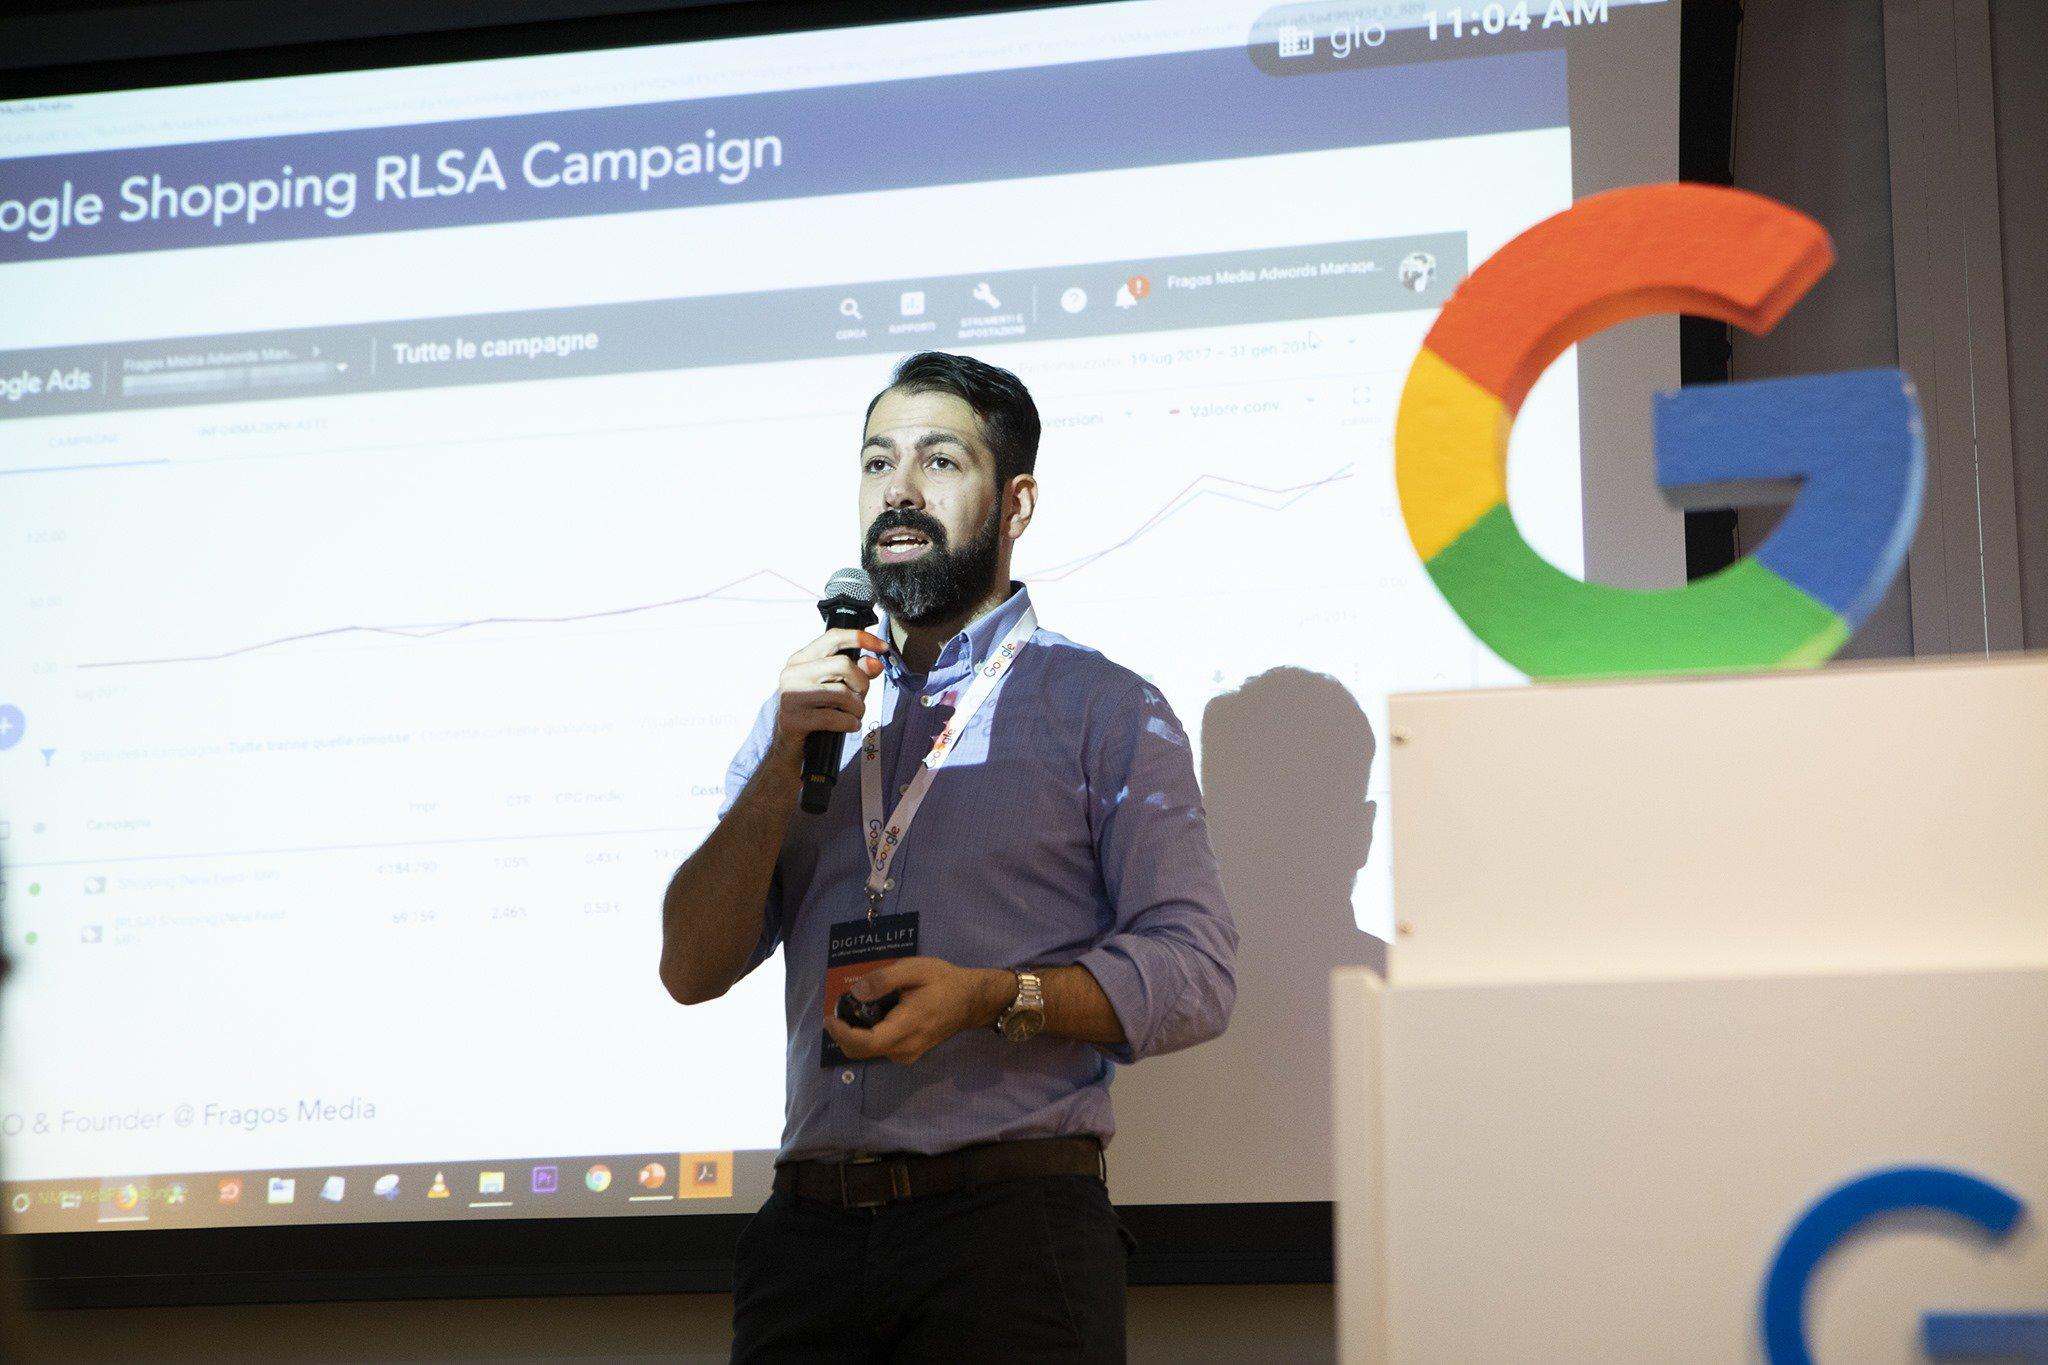 #SIOS19 StartupItalia Village | Fragos Media, l'agenzia di advertising Google Premier Partner